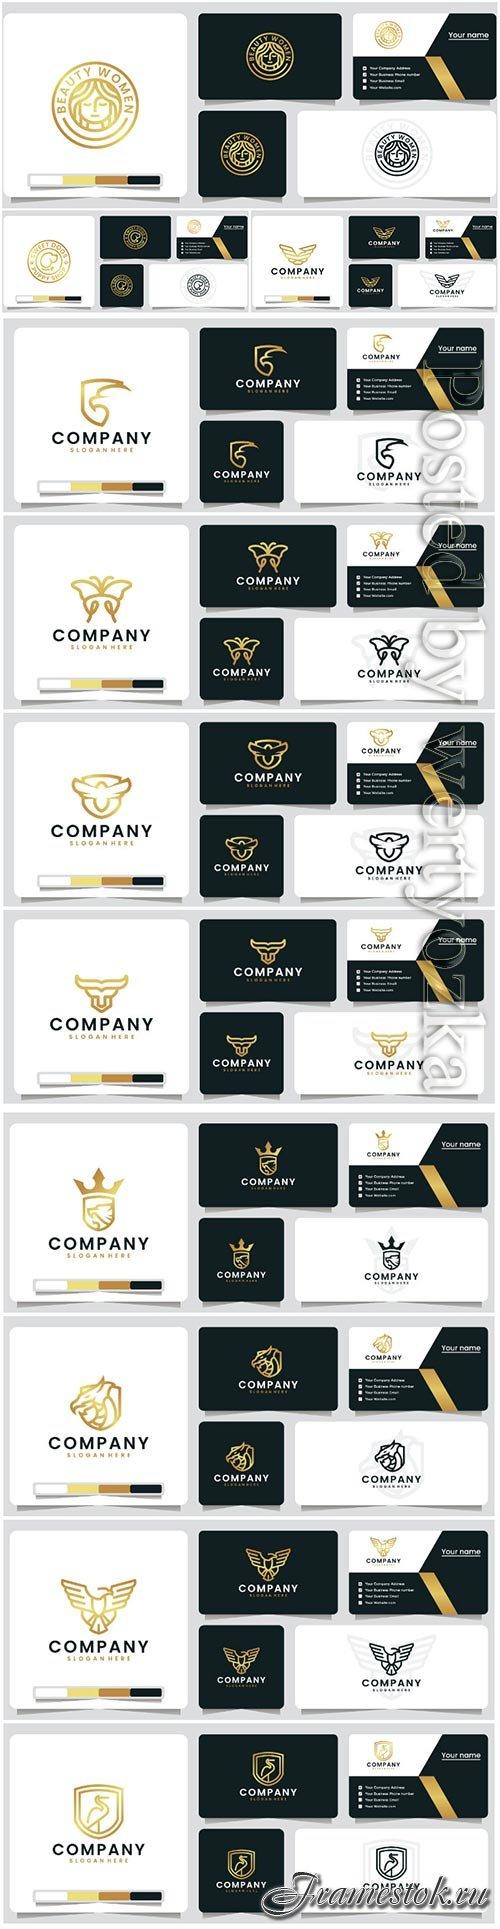 Golden color luxury logo vector design template